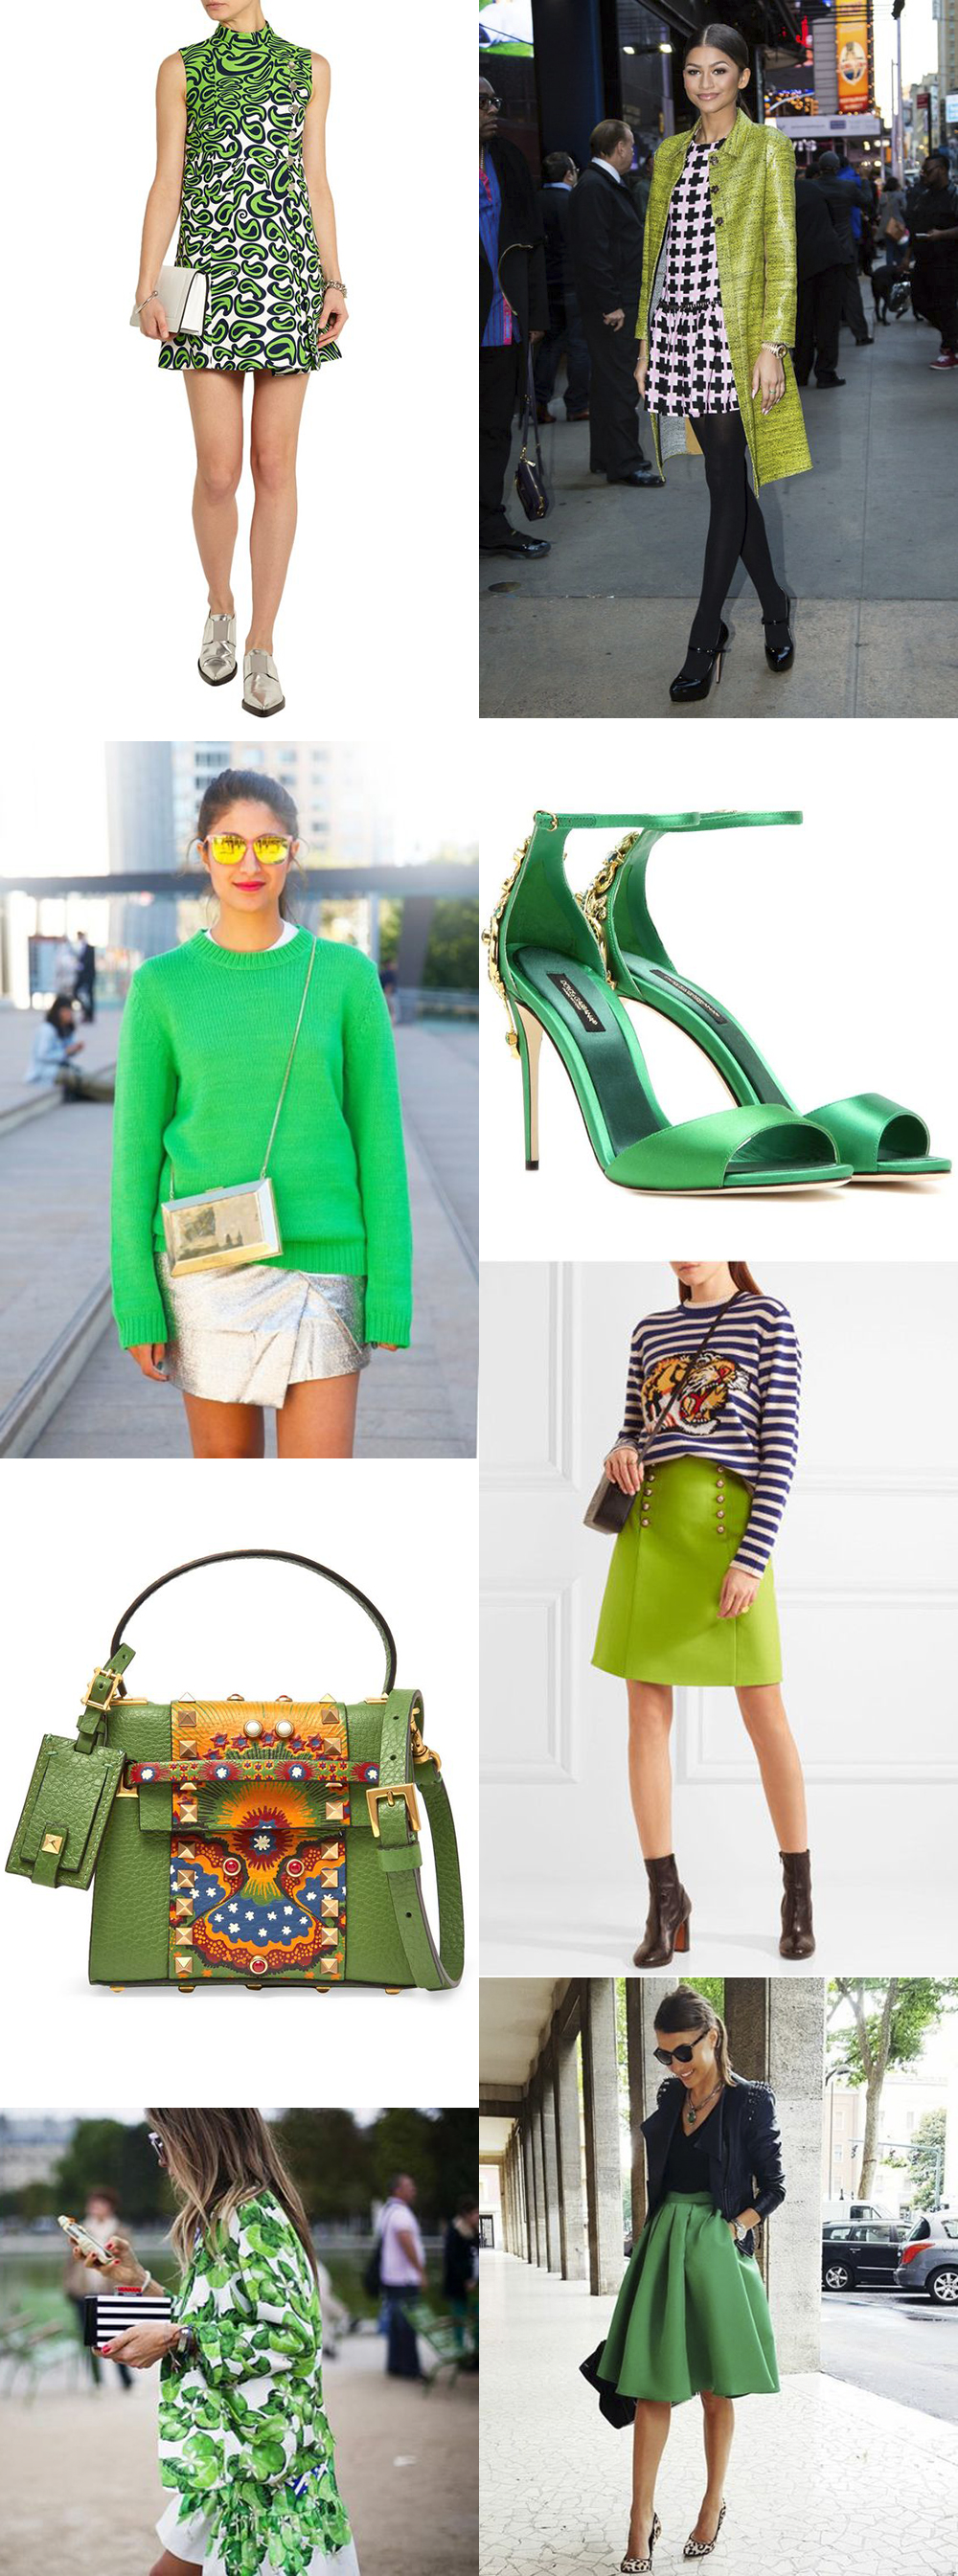 Greenery Fashion Looks